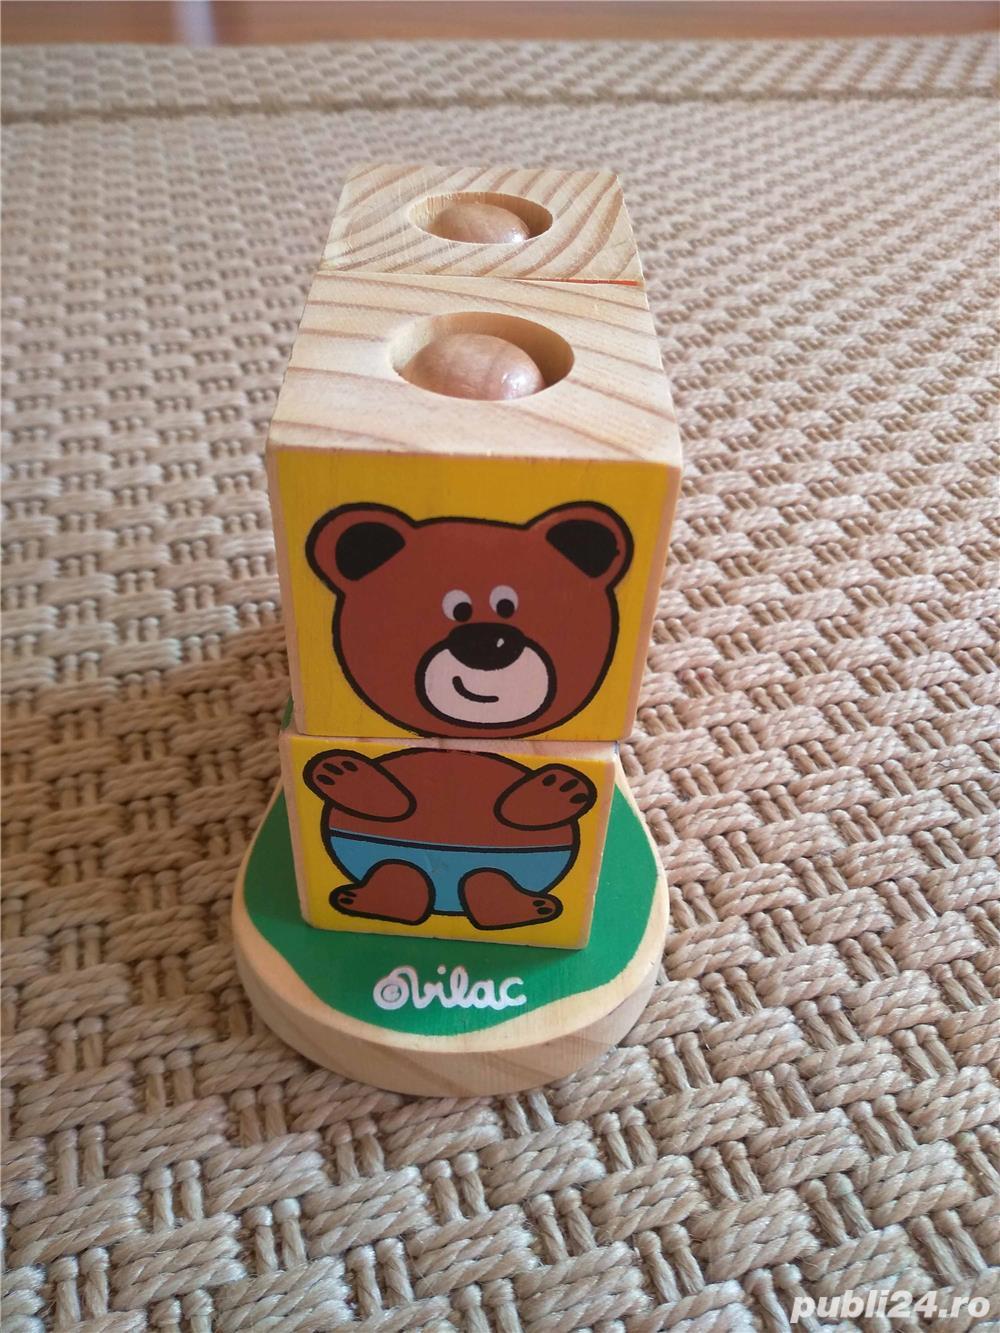 Vand set 4 cuburi tip puzzle marca Vilac, cu animalute